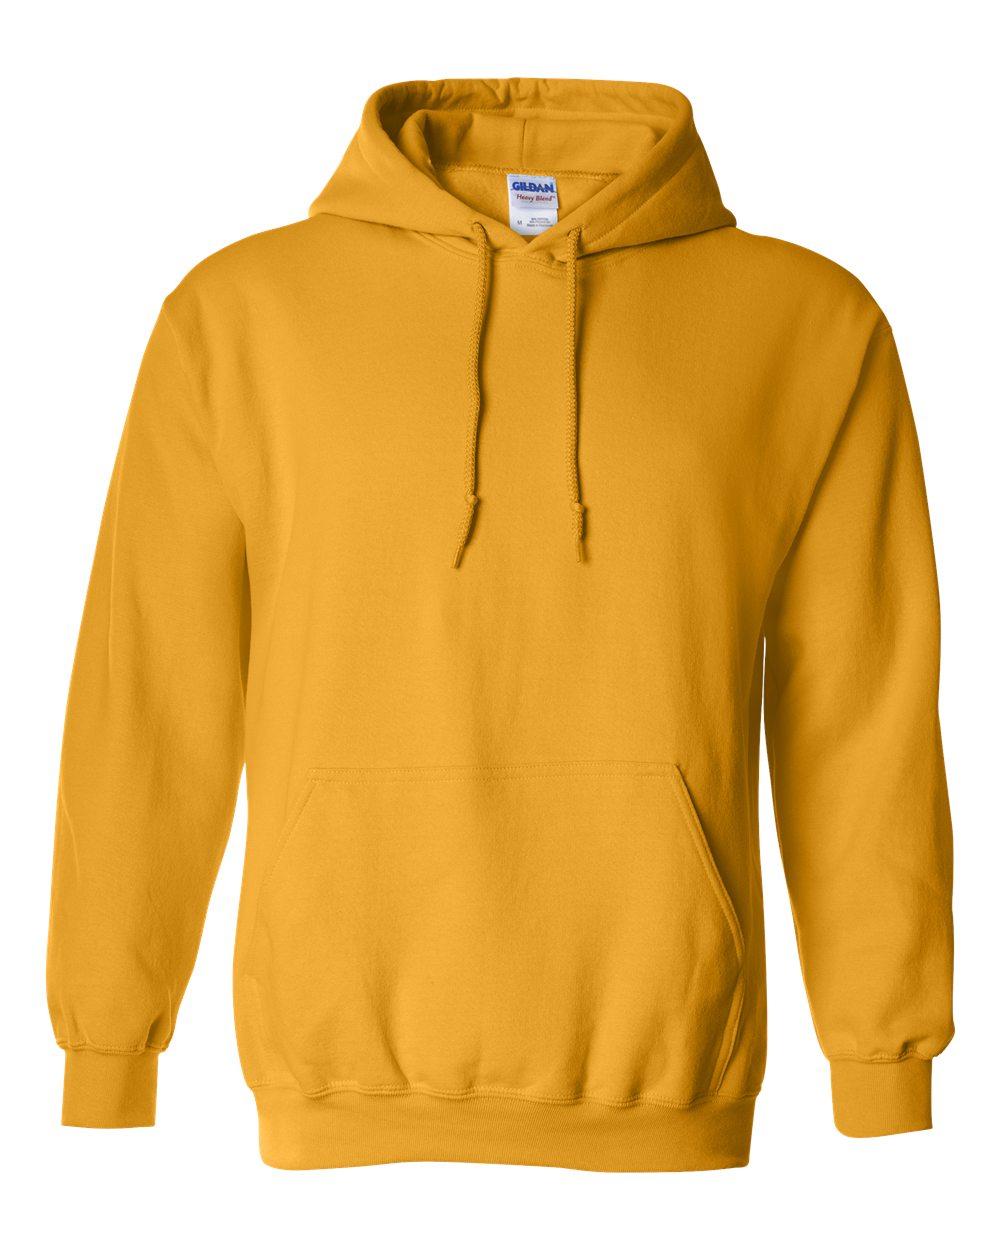 Gildan-Mens-Blank-Hoodie-Heavy-Blend-Hooded-Sweatshirt-Solid-18500-up-to-5XL thumbnail 33